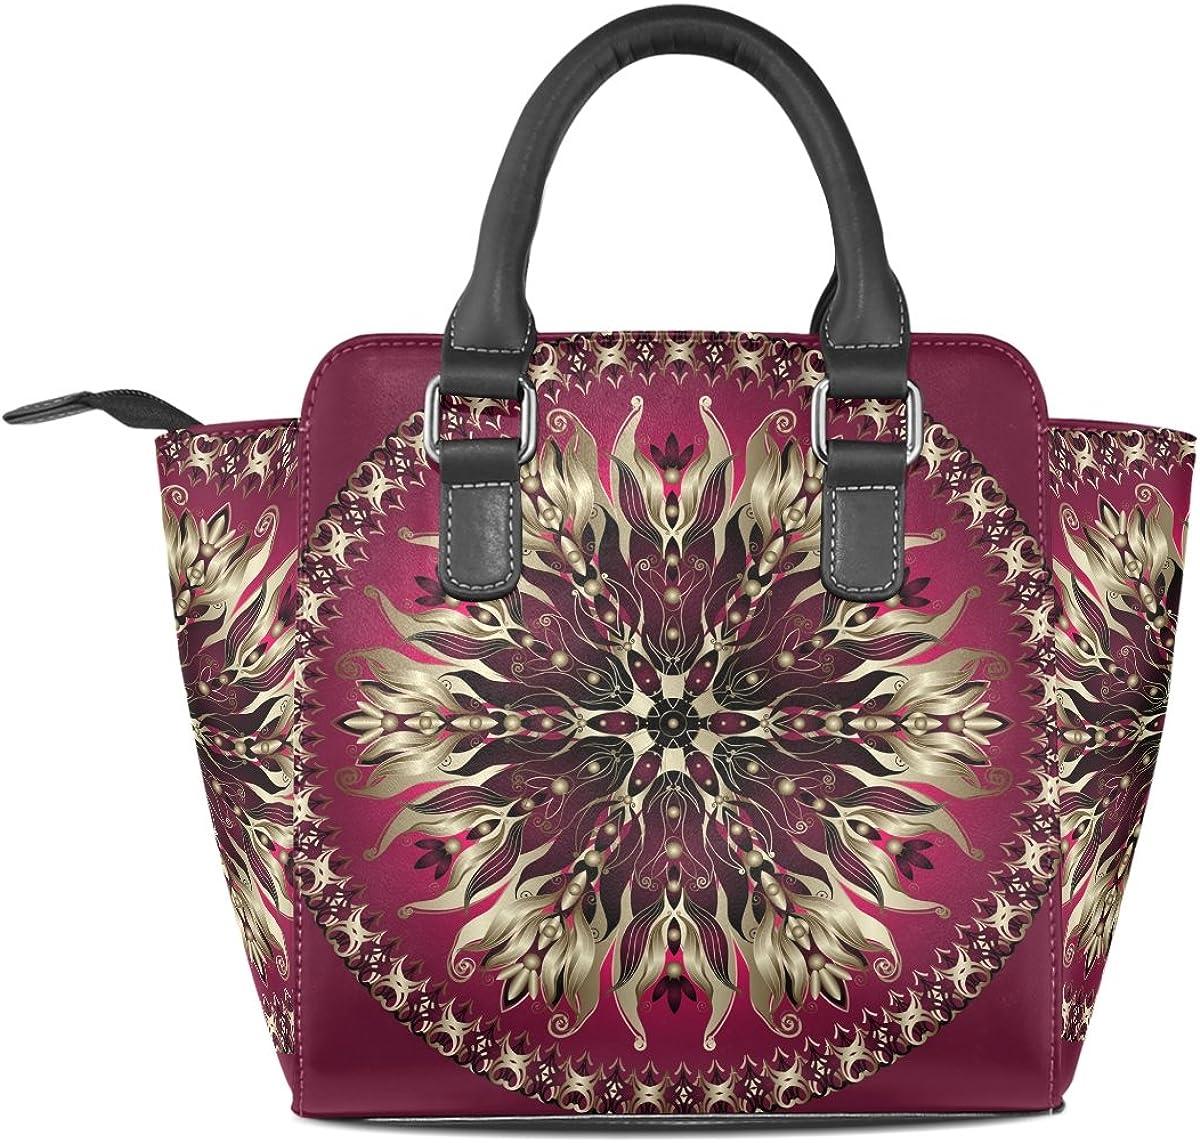 AURELIOR Purple Gold Round Floral Pattern Handbags Womens PU Leather Top-Handle Shoulder Bags